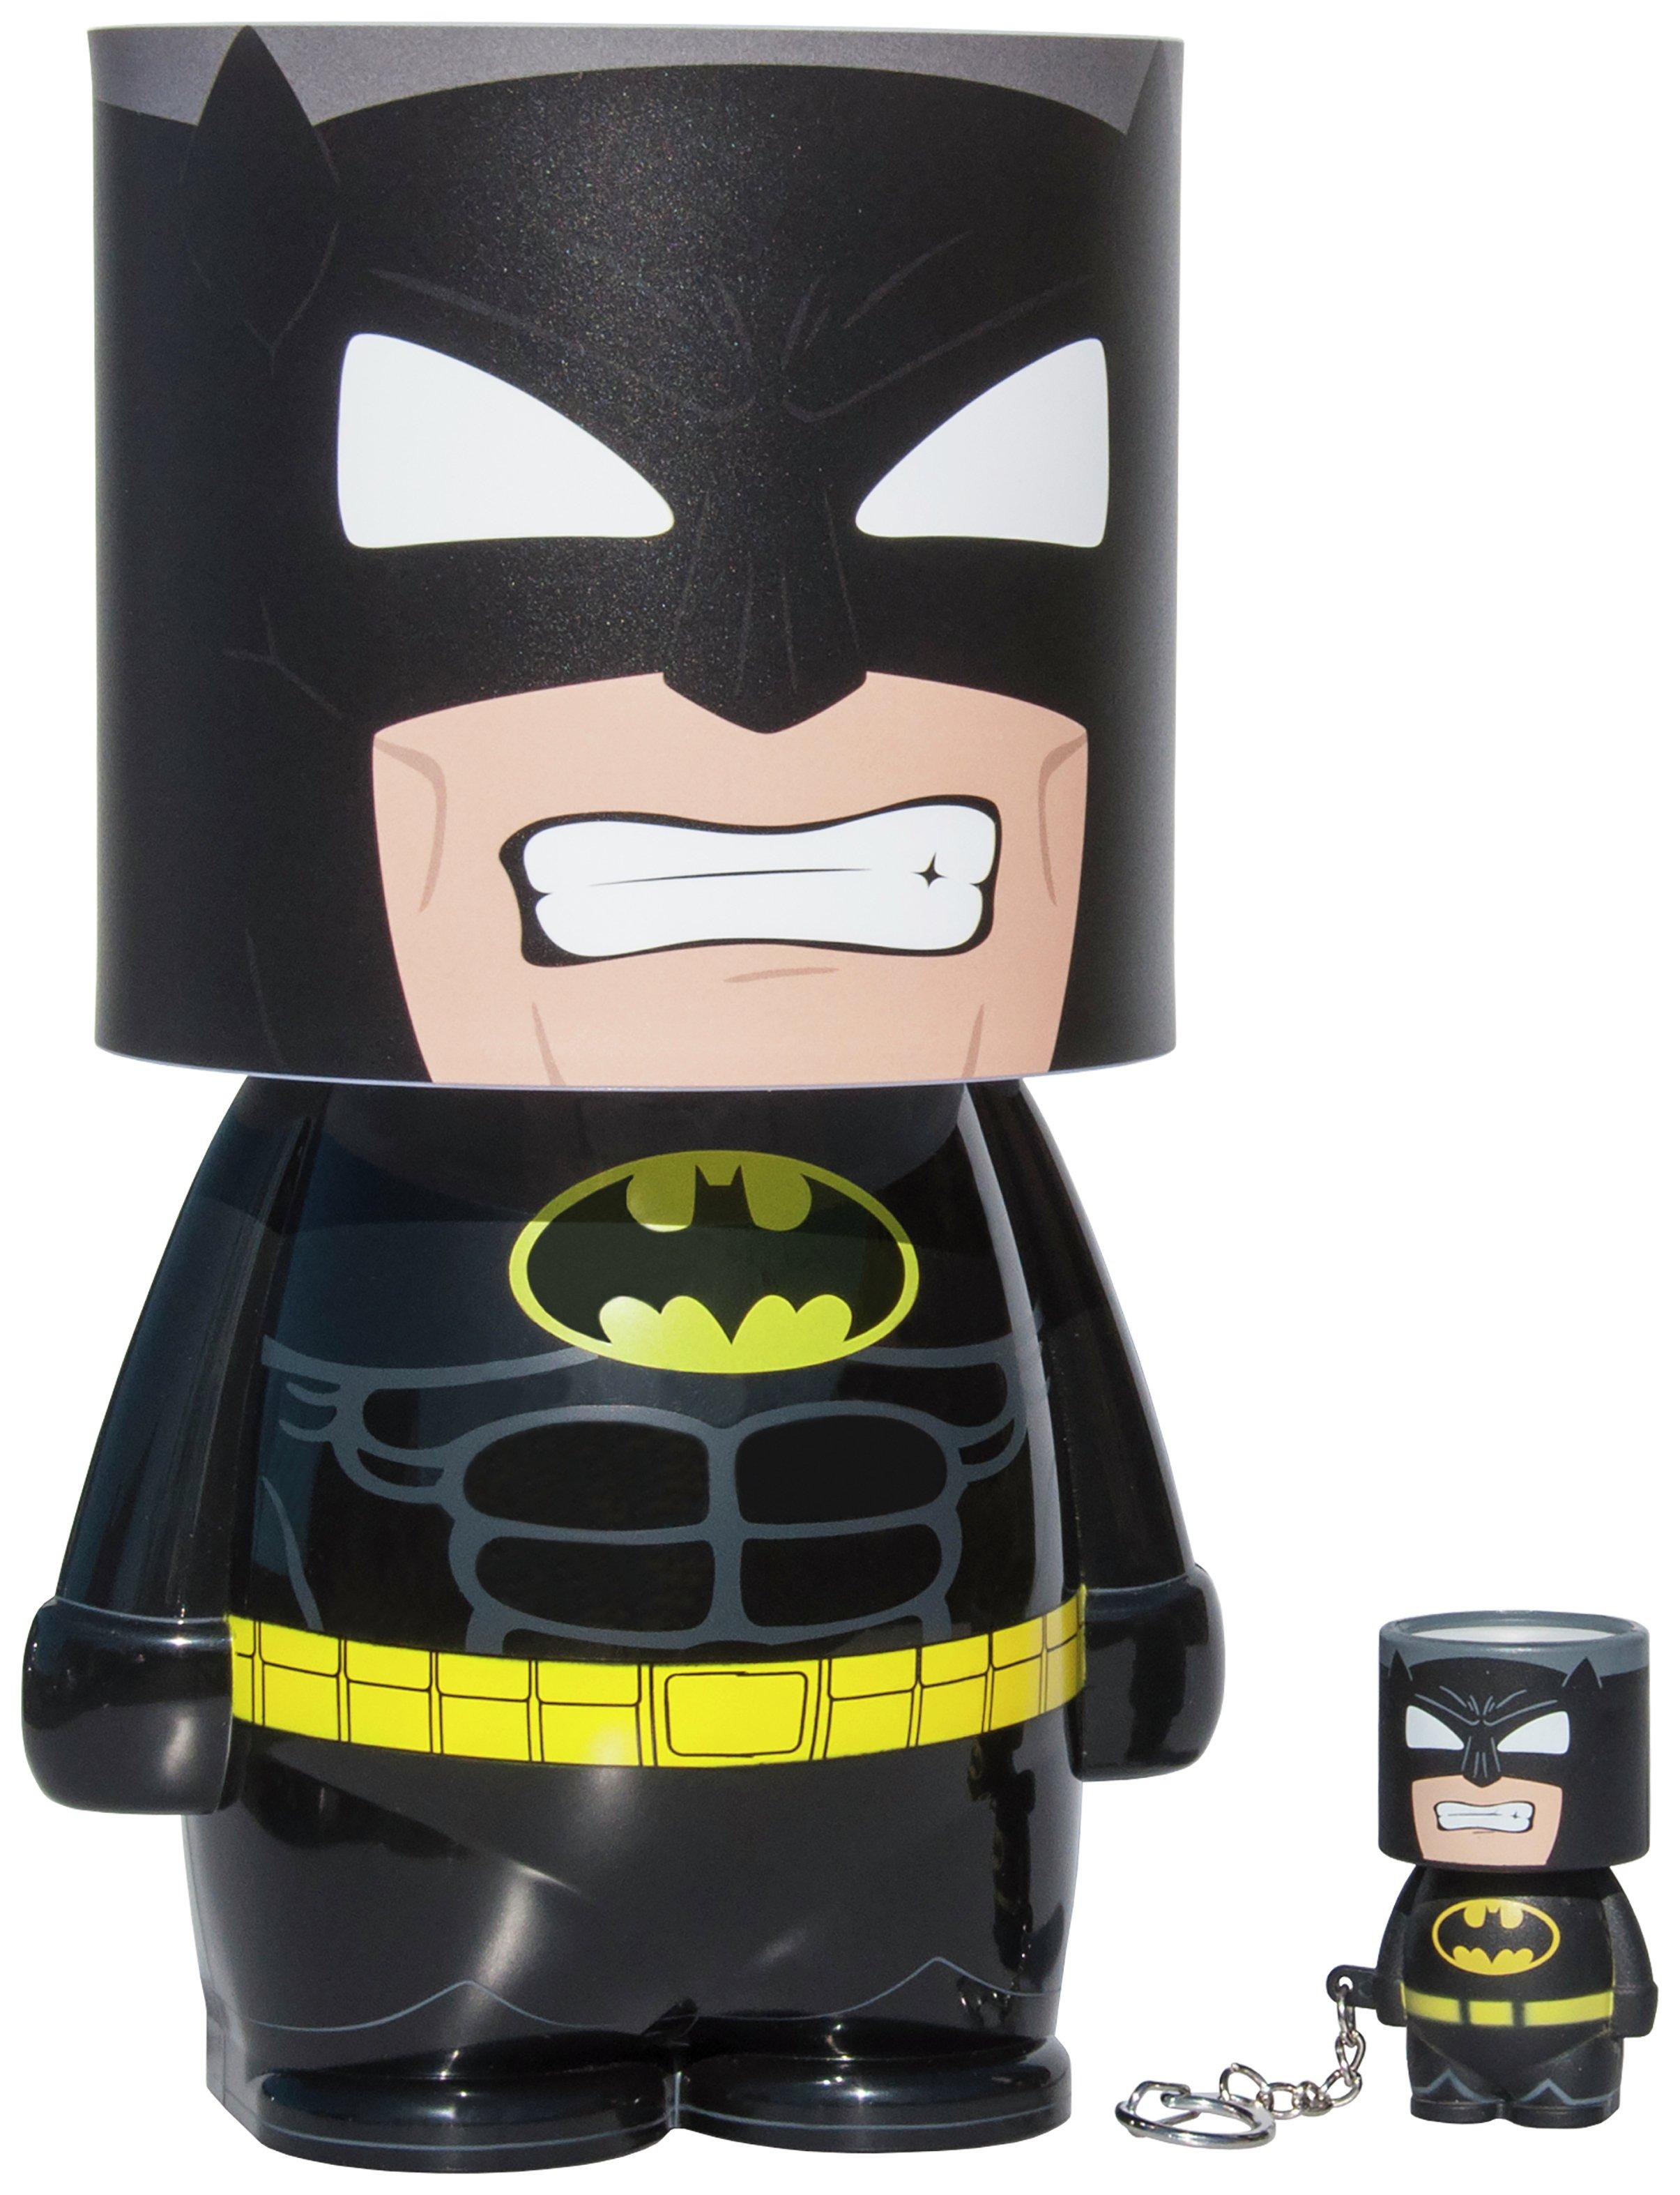 Image of Batman Lookalite Lamp